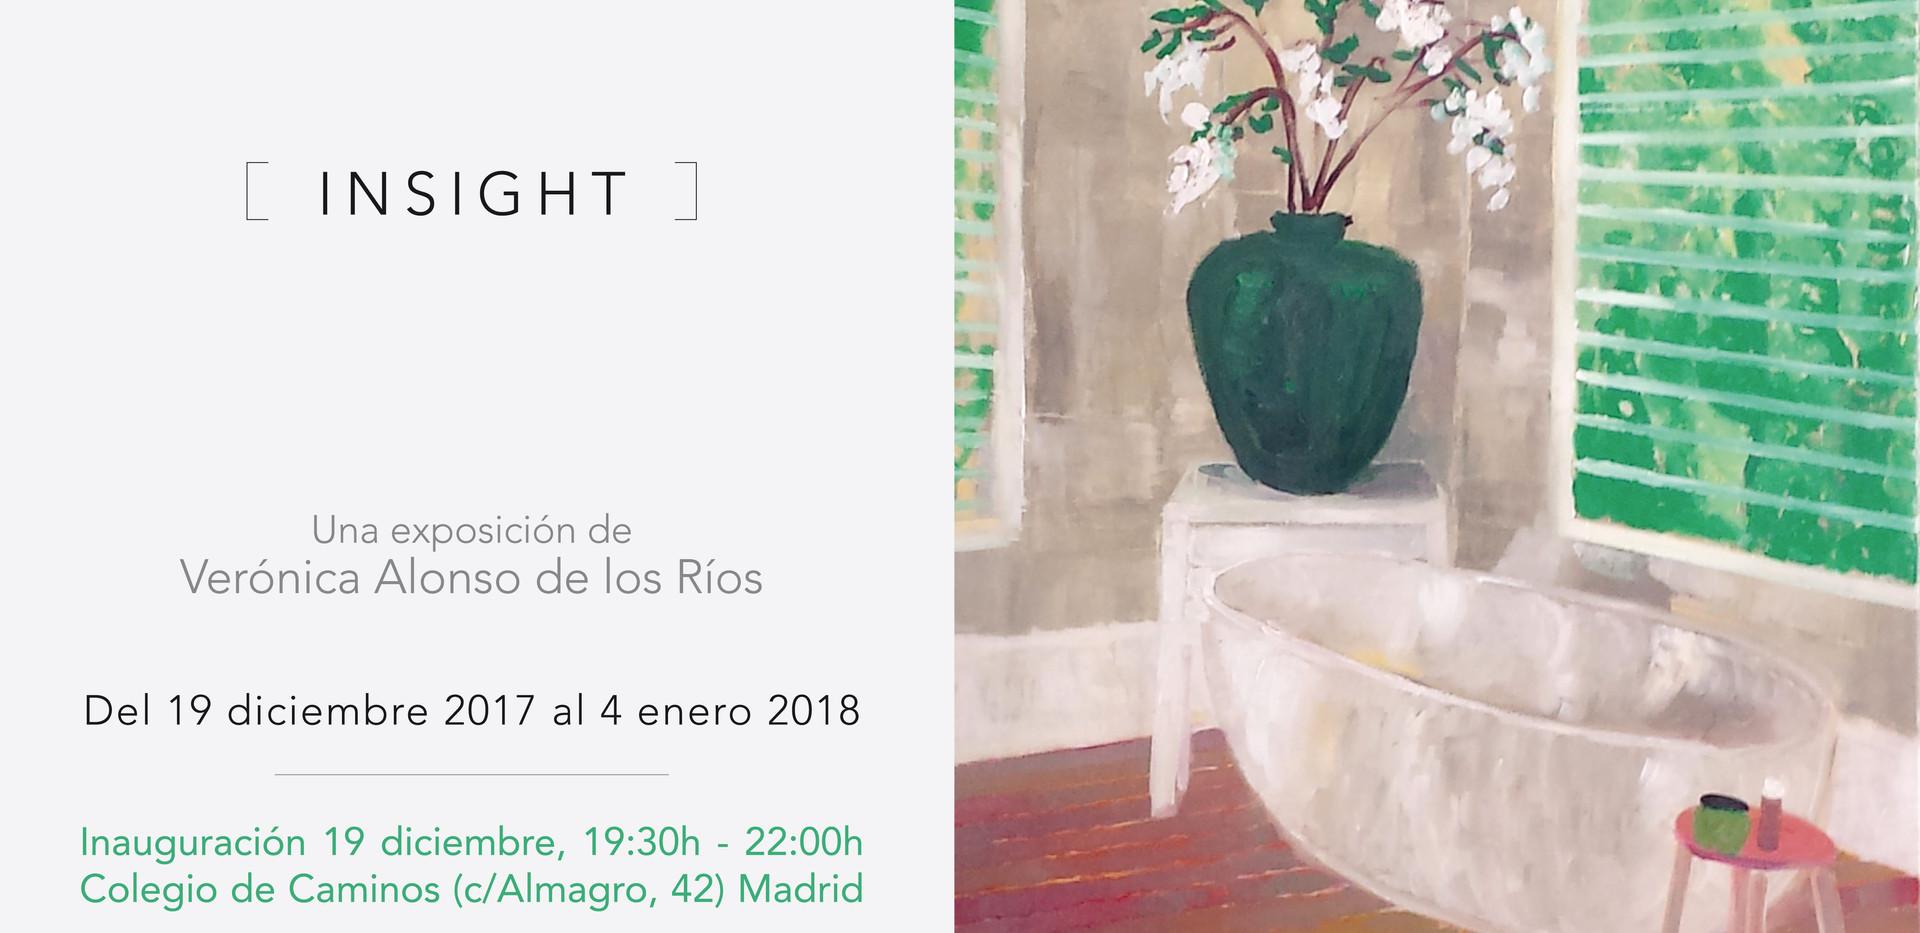 EXPO_INSIGHT_Verónica_AlonsodelosRíos201